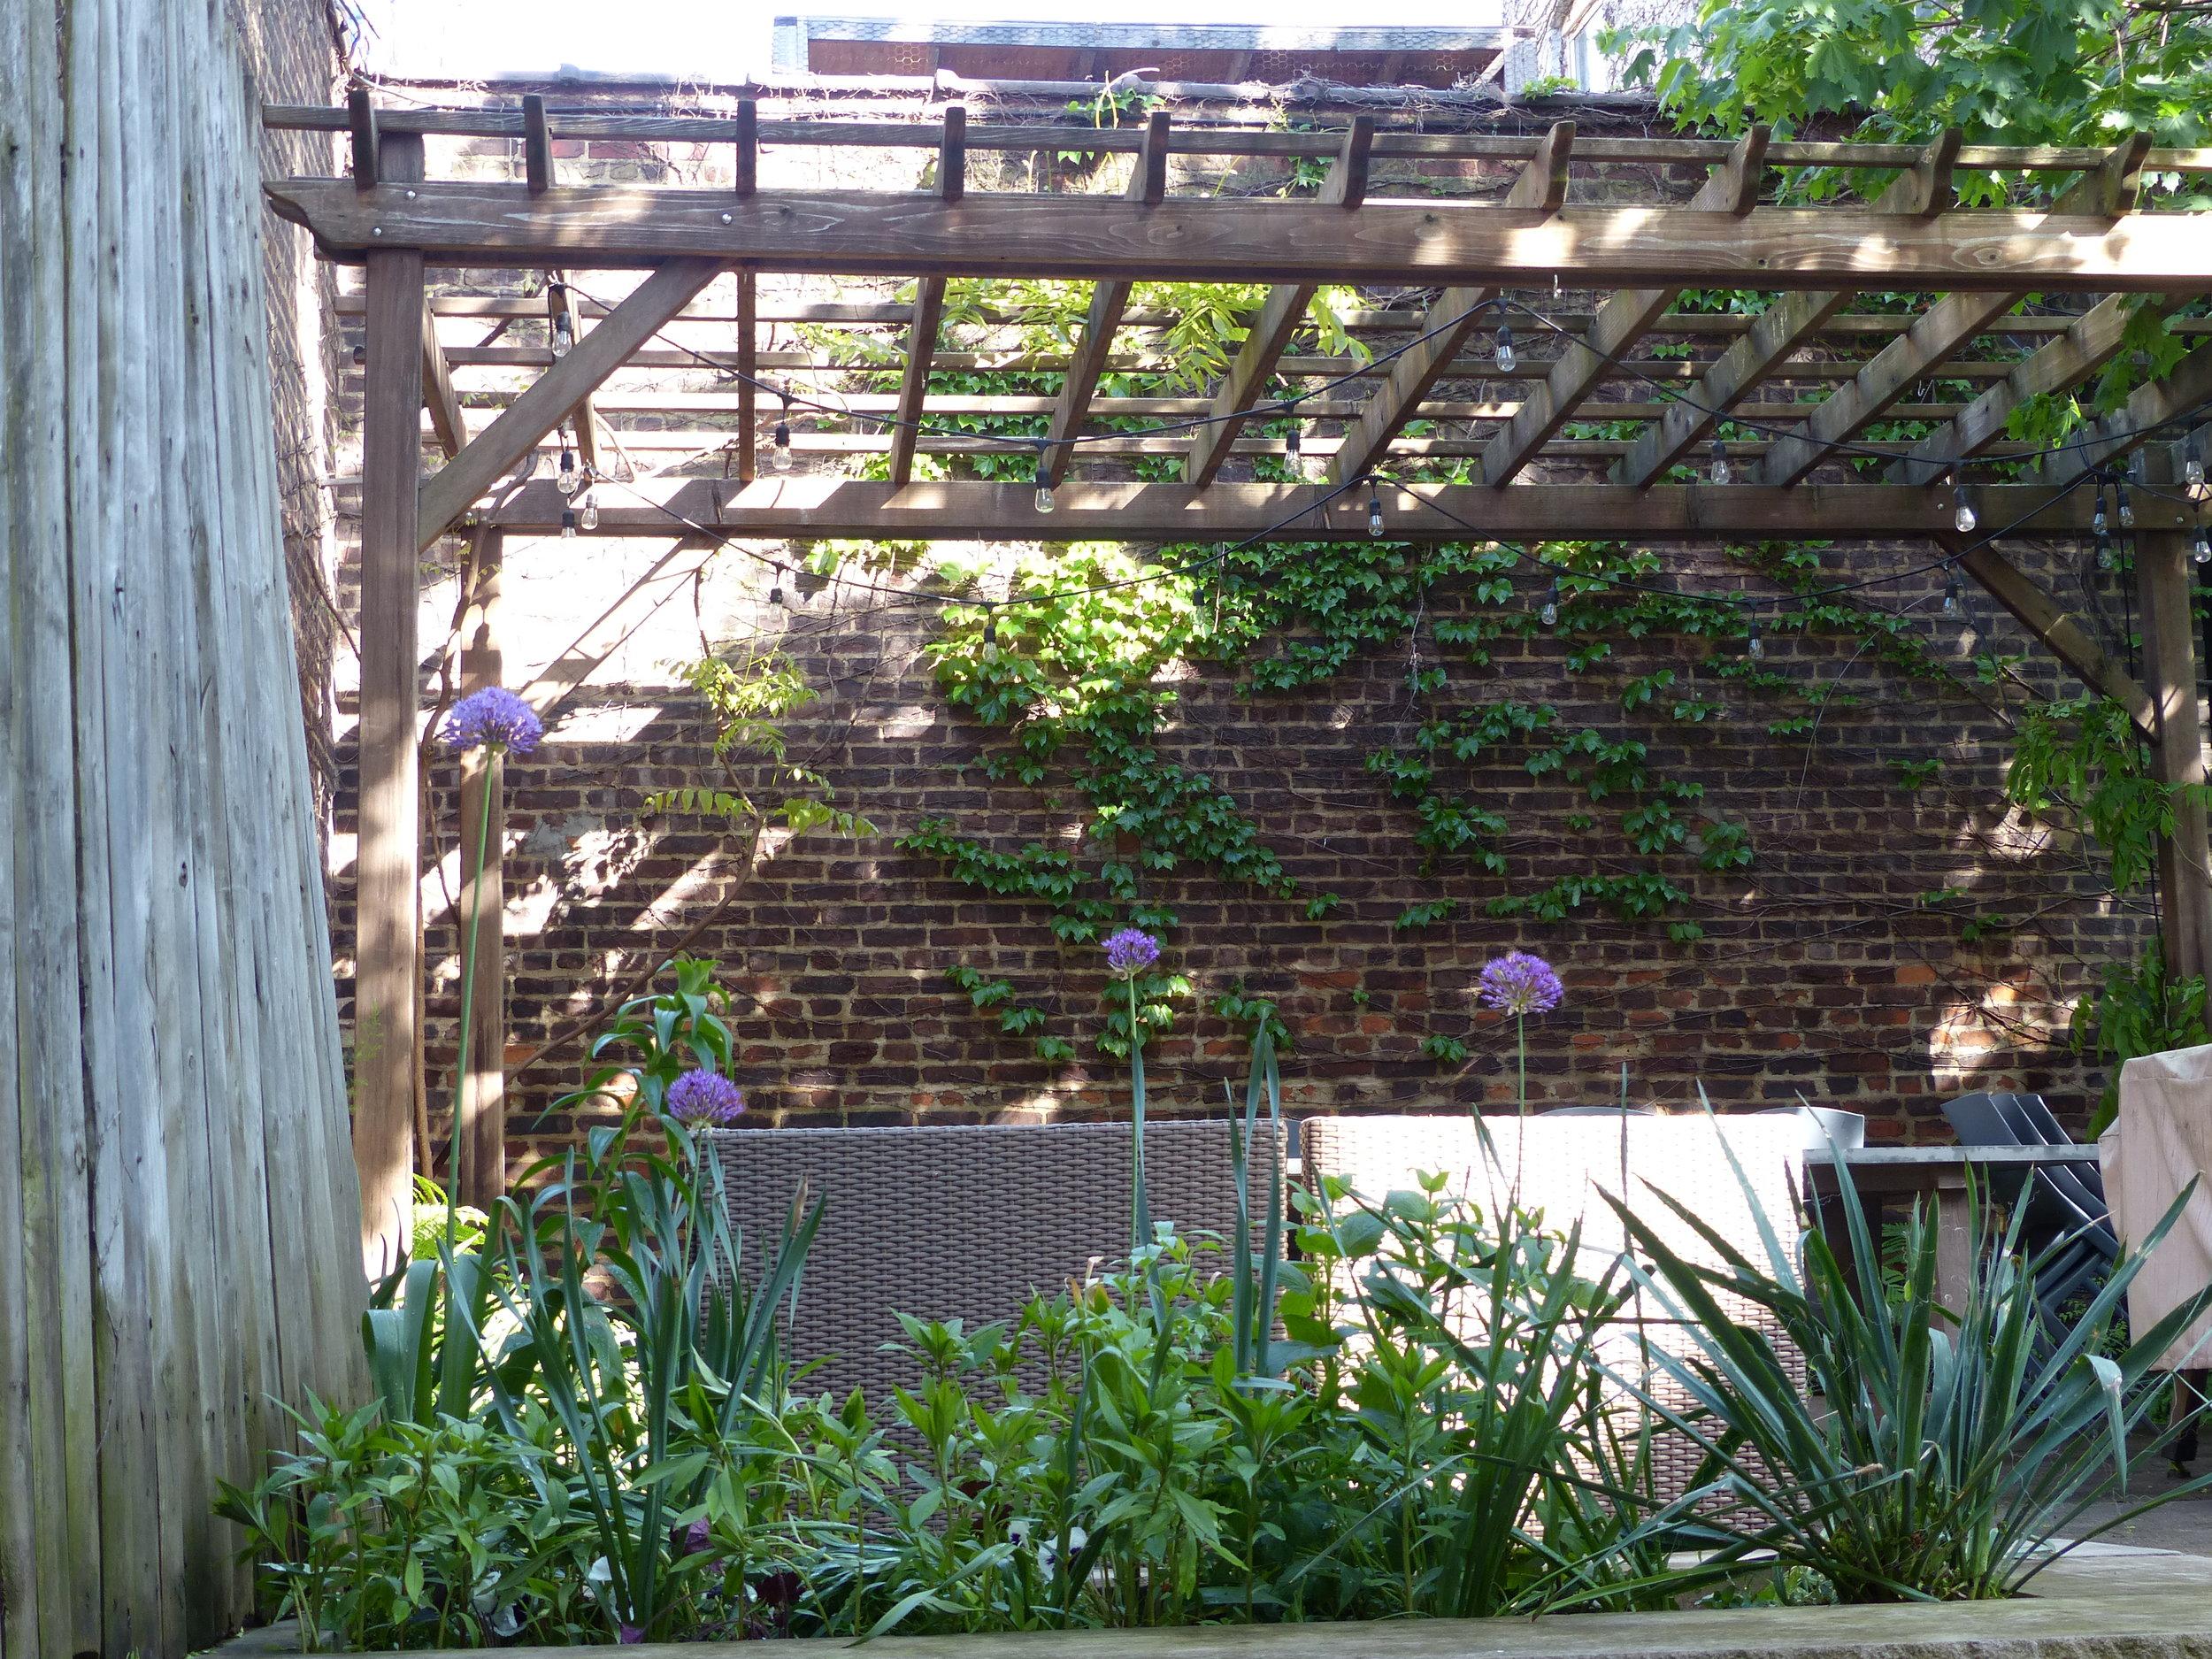 brooklyn_plant_studio_garden_25.JPG